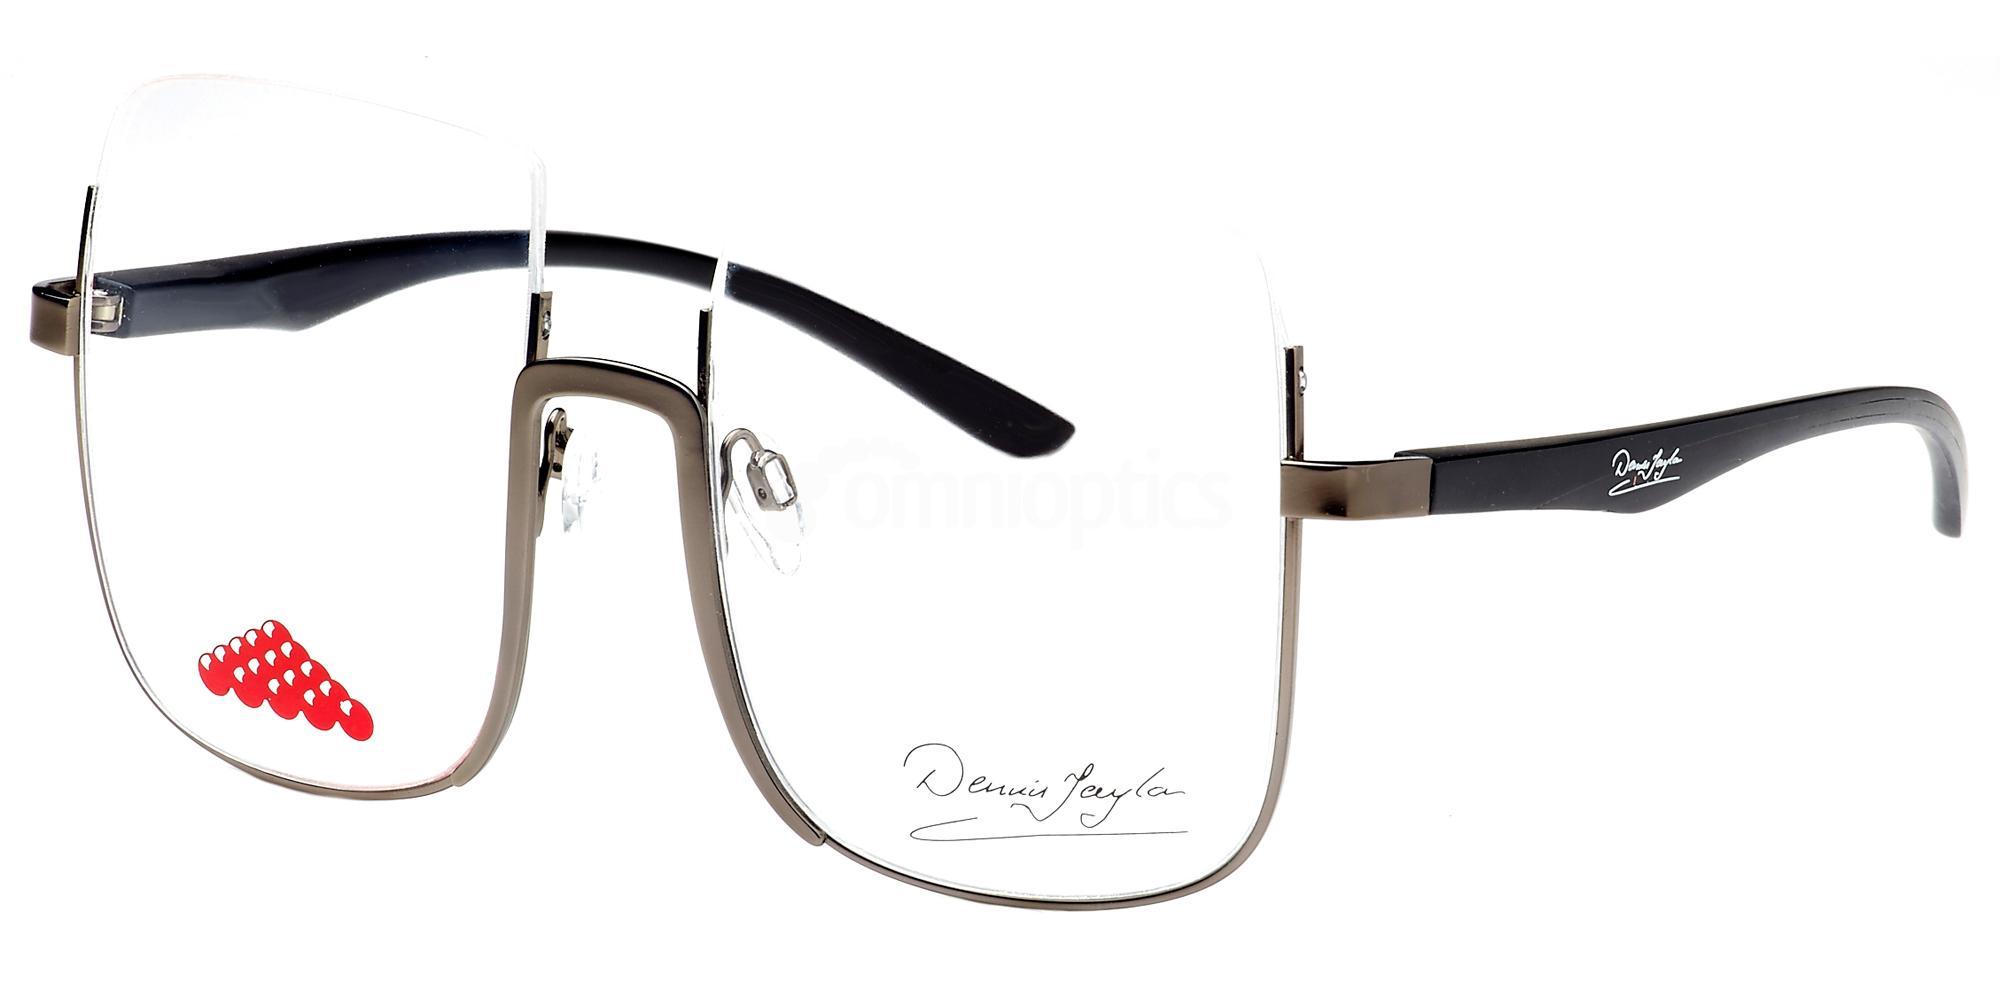 C1 DTSN01 - Pro-Snooker Glasses , Dennis Taylor